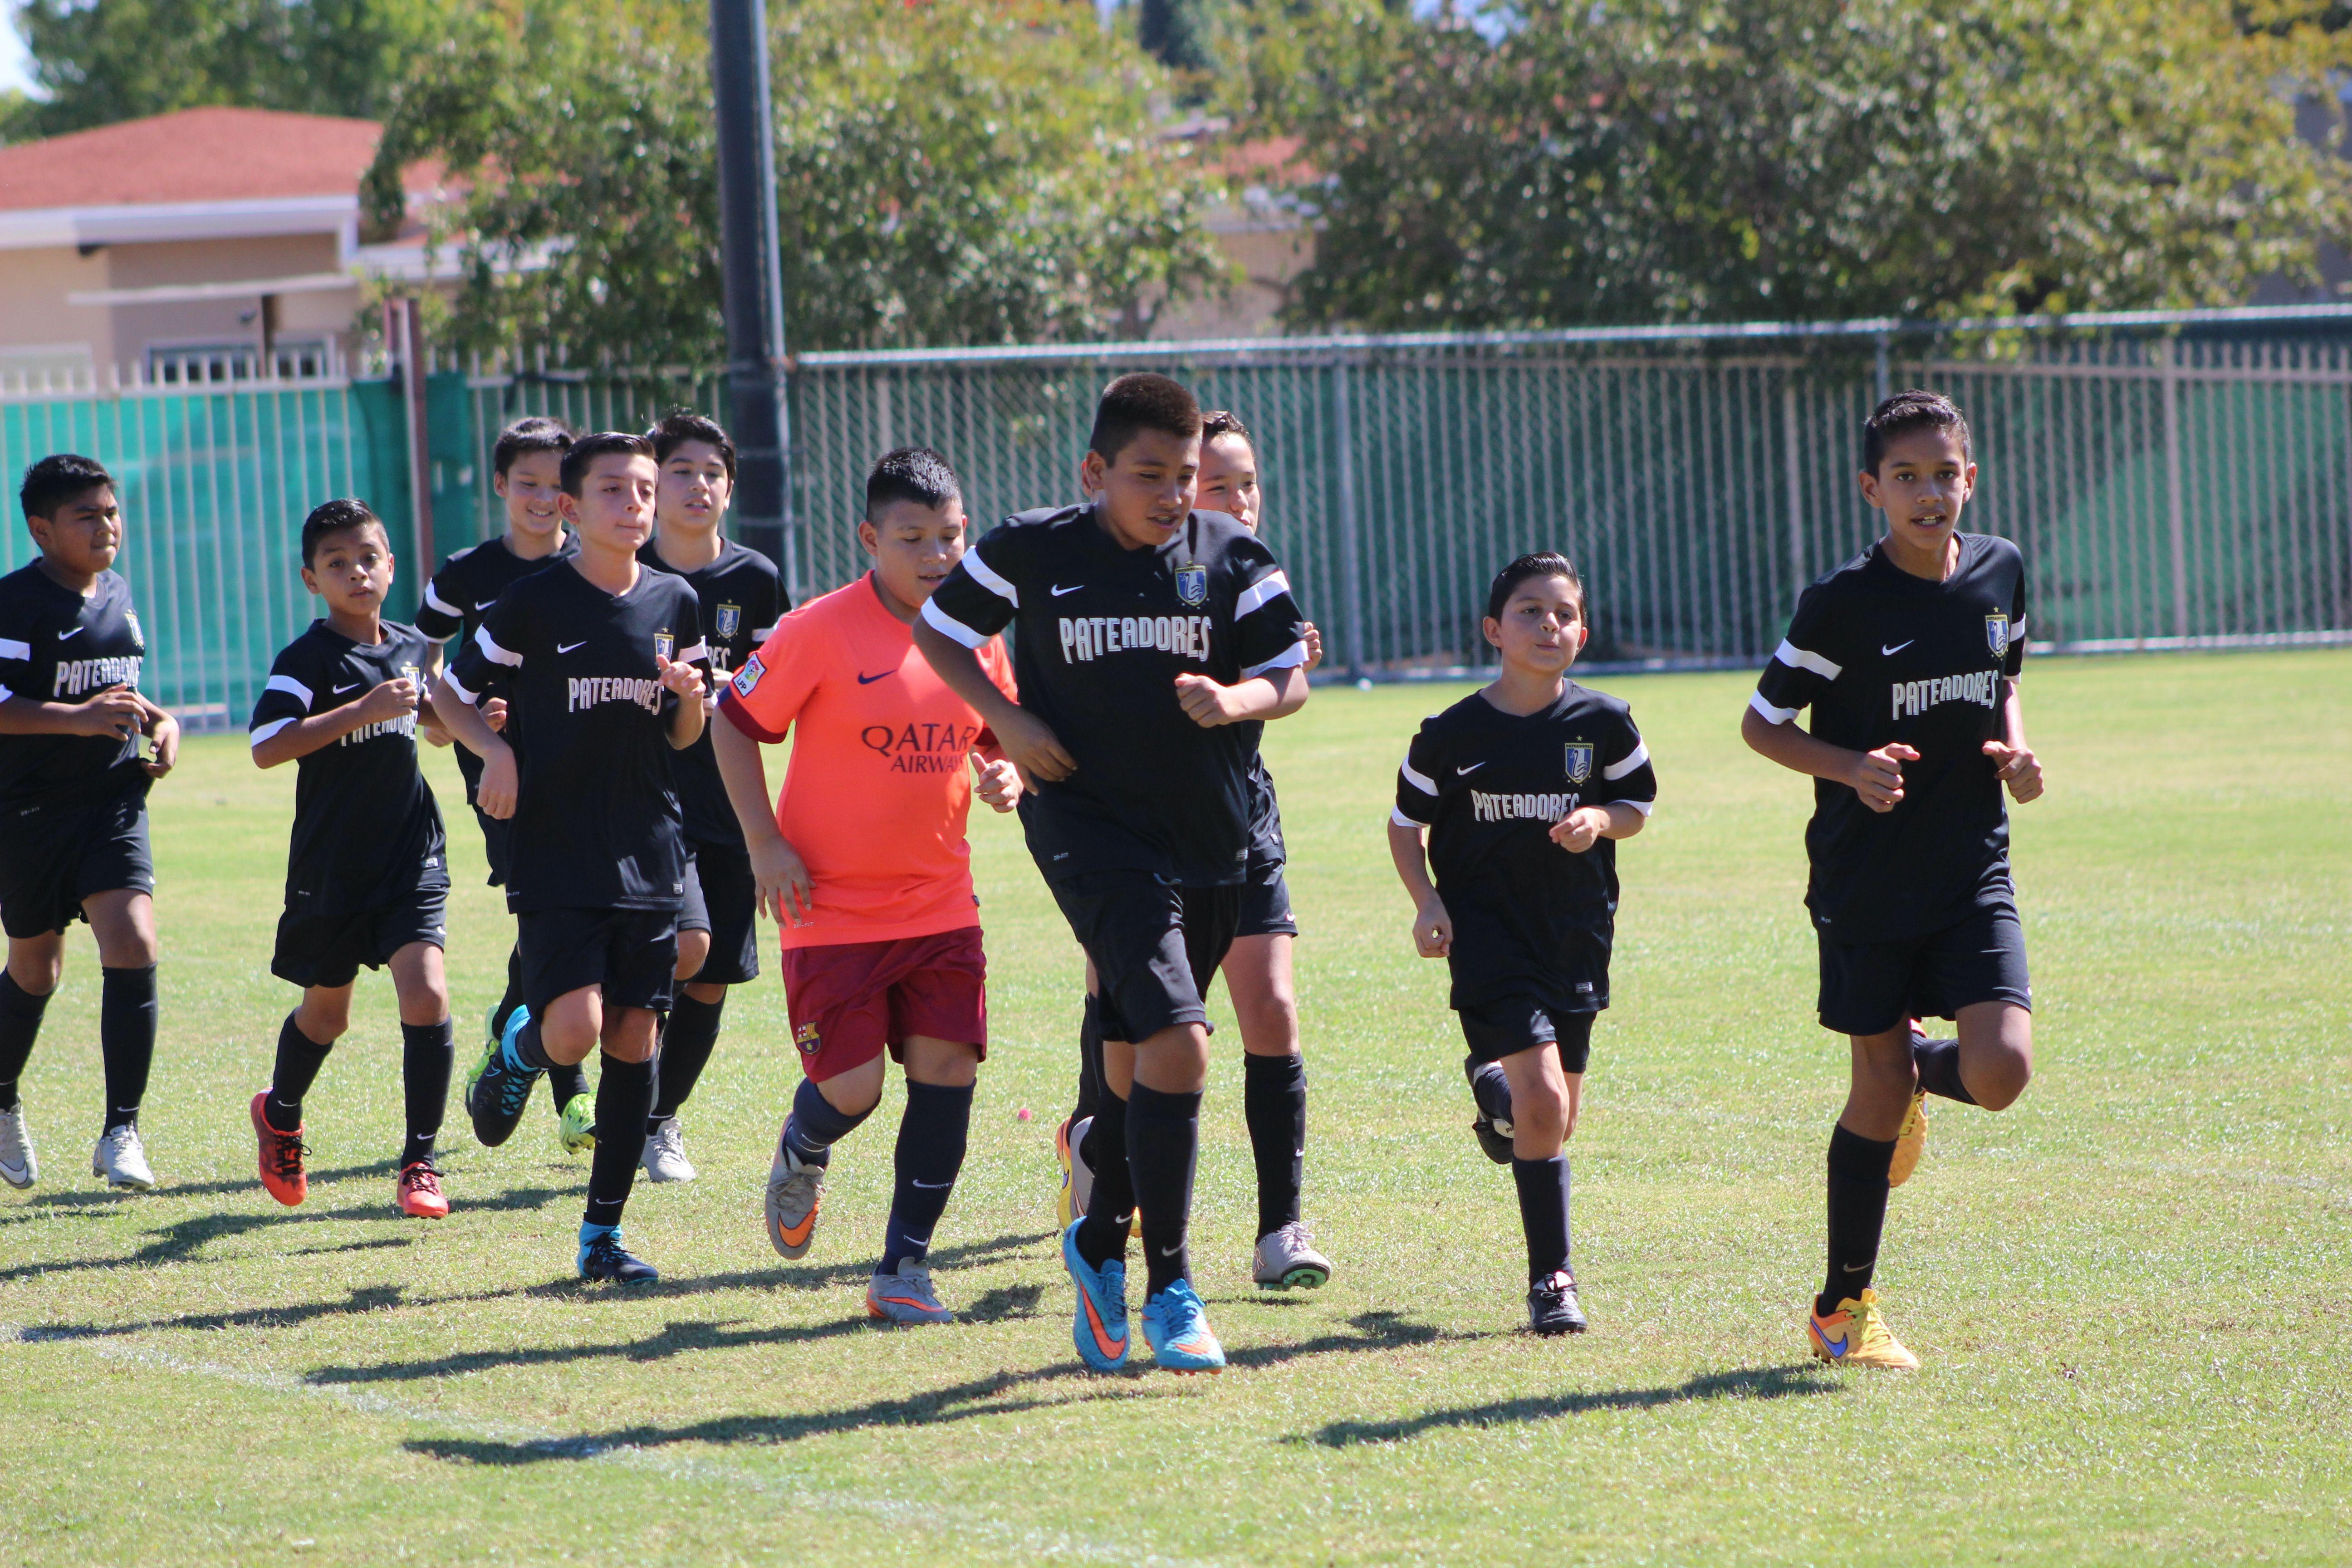 Warmups Youth Soccer Soccer League Soccer Club